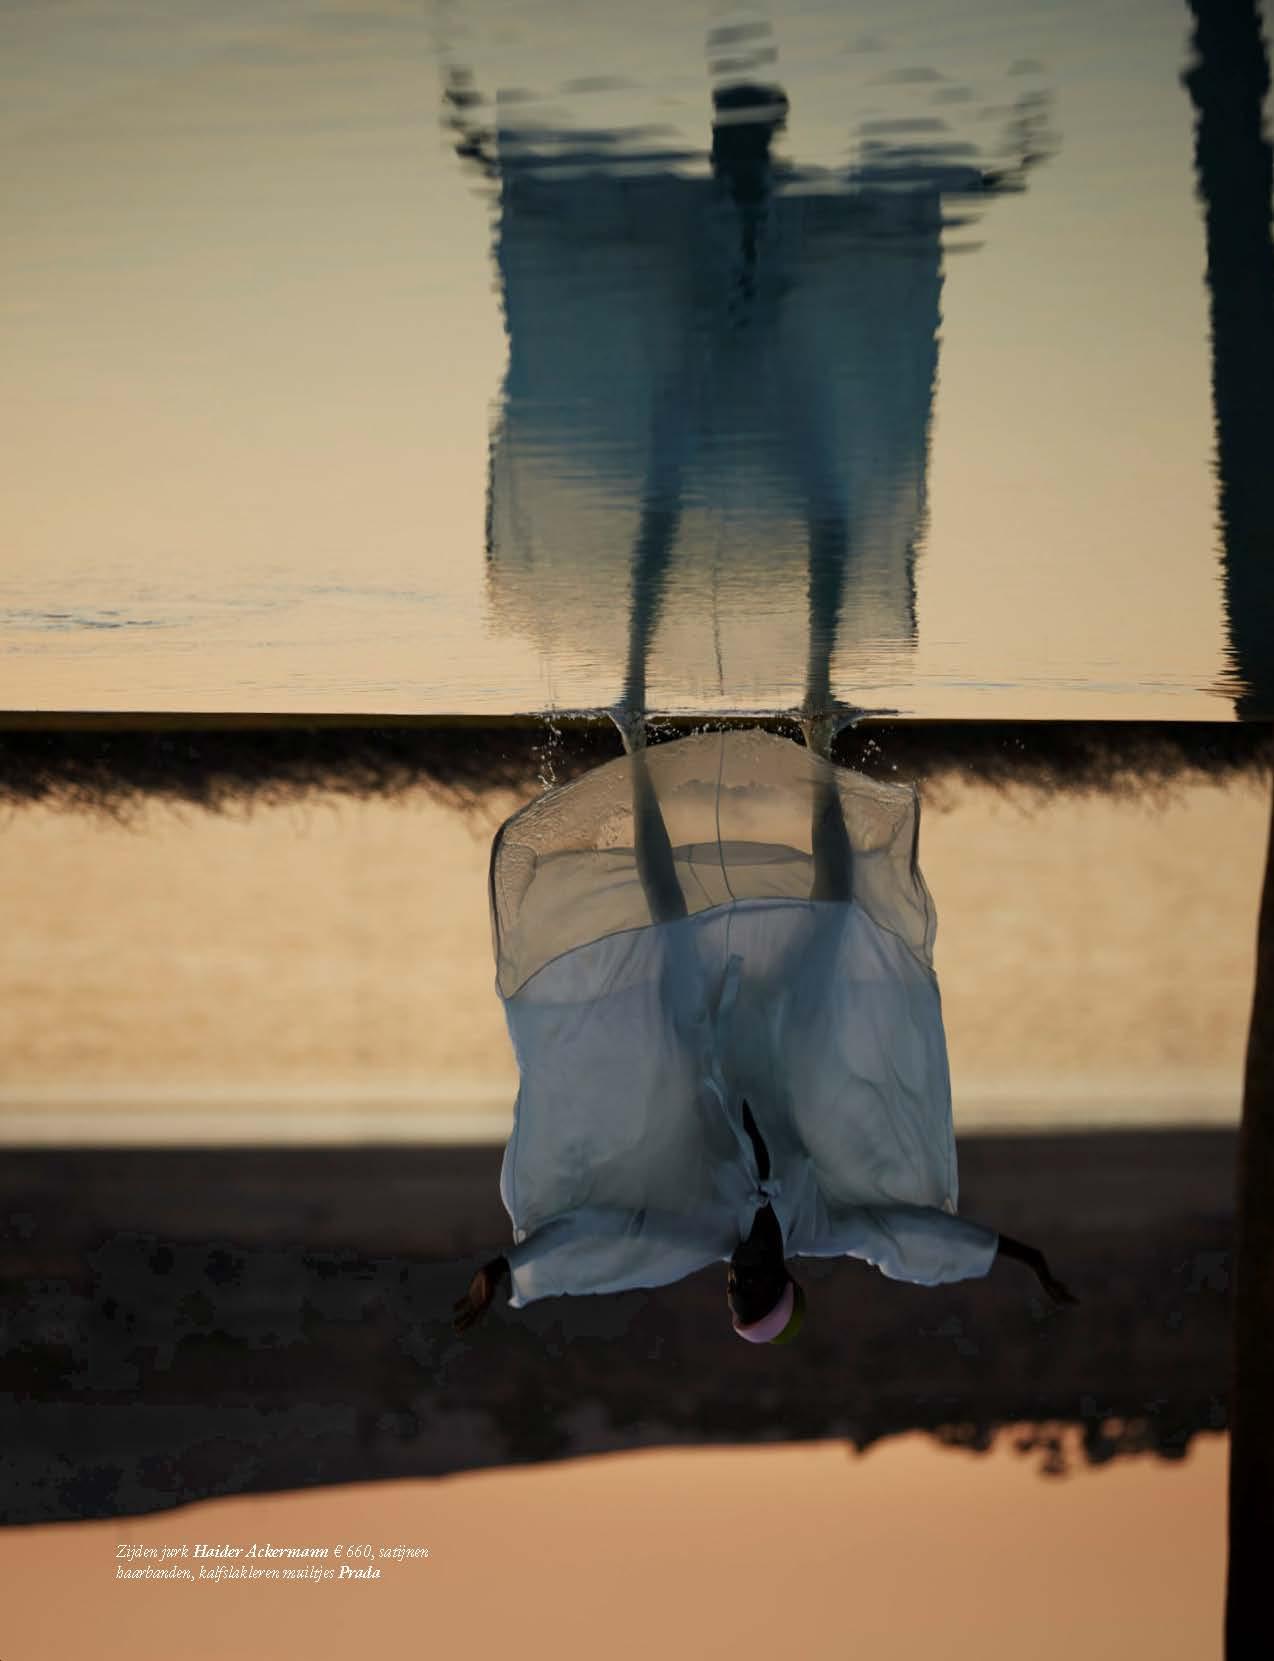 Niko Riam by Carlijn Jacobs for Vogue Netherlands (9).jpg